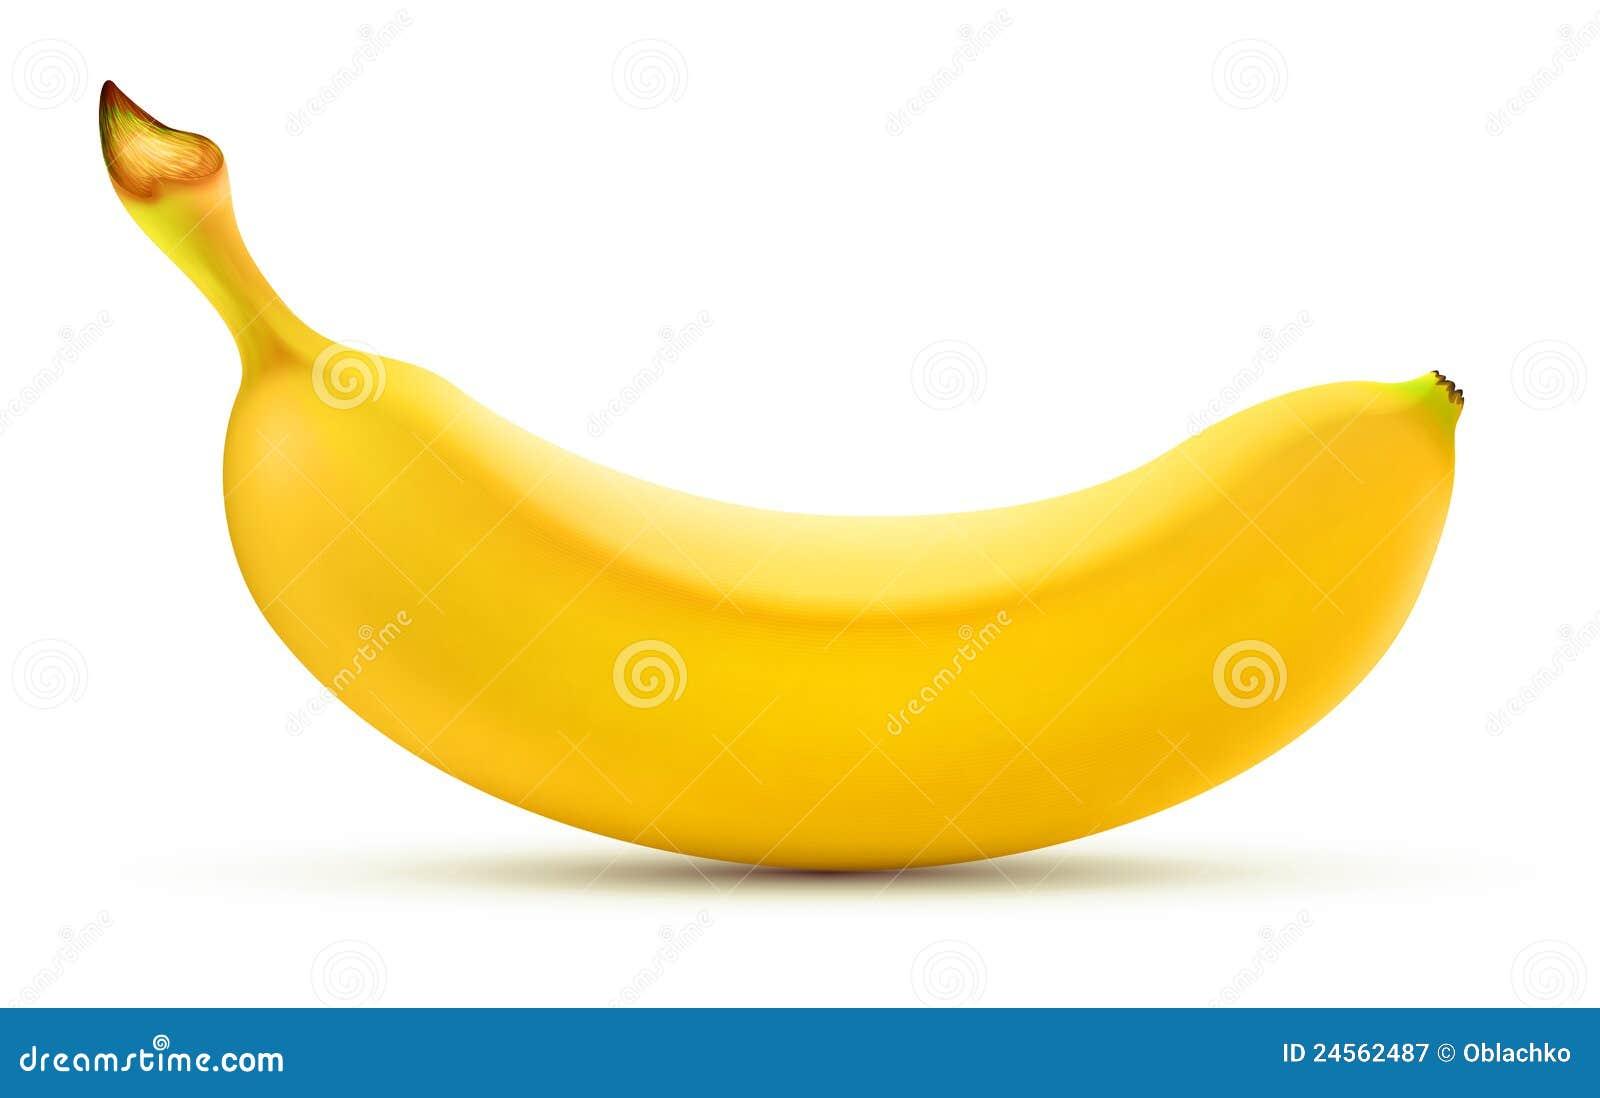 shiny yellow banana royalty free stock photography image red crayon clipart Brown Crayon Clip Art